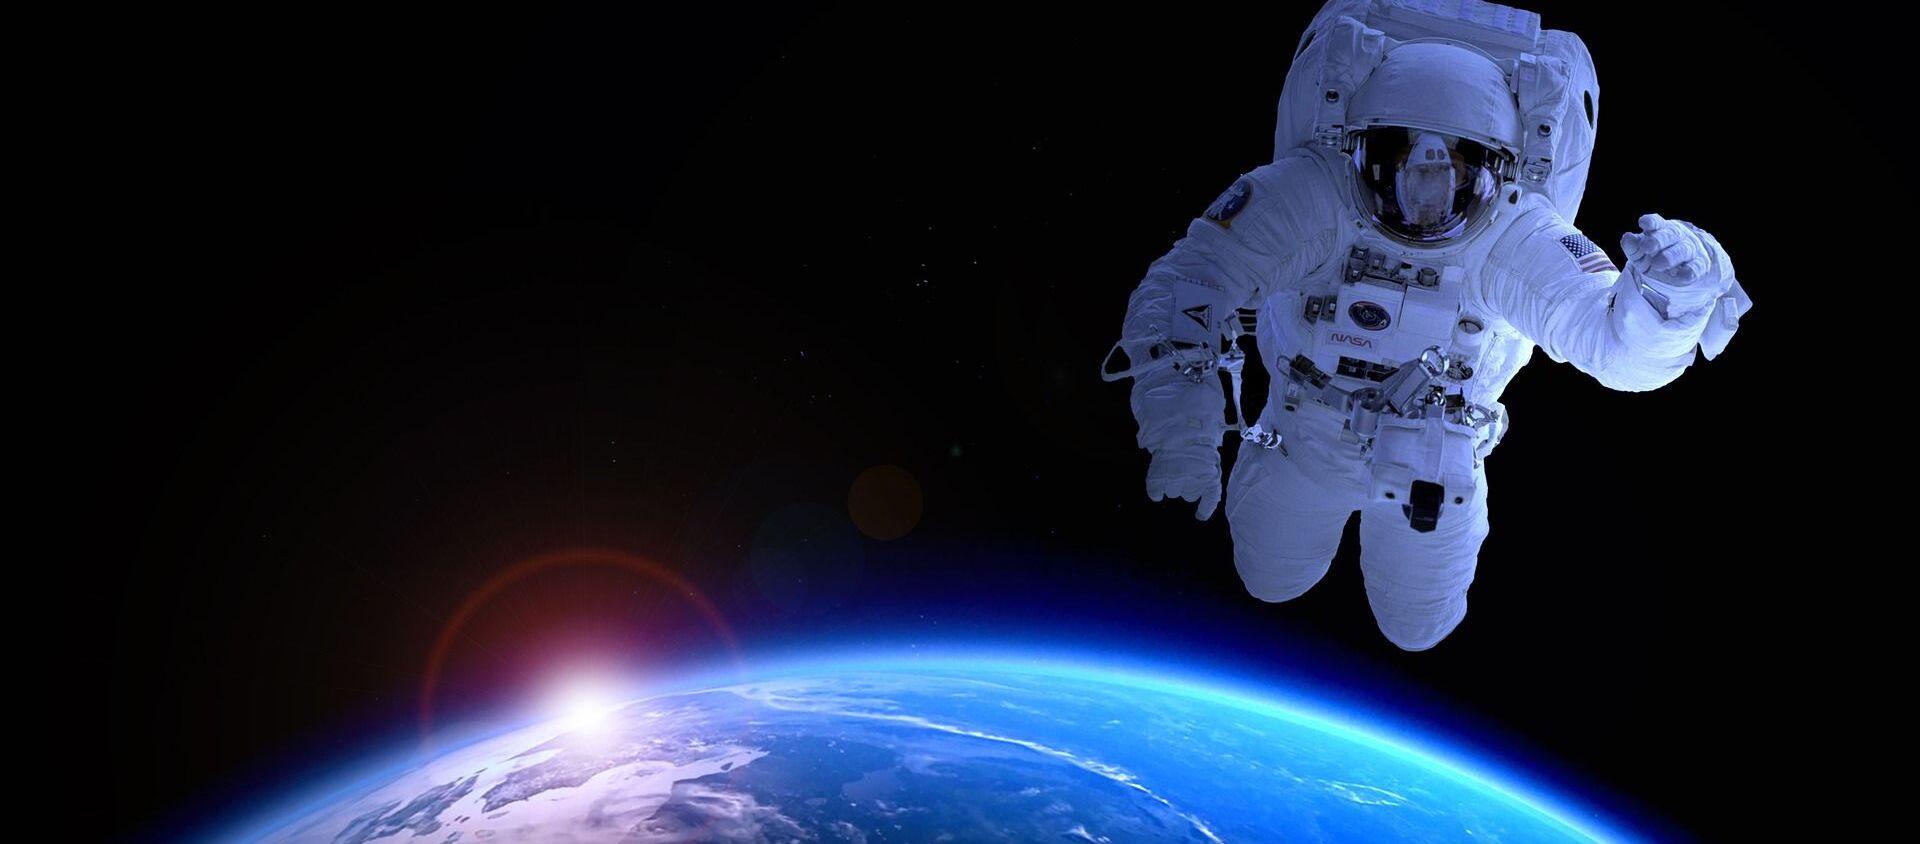 Un astronauta  estadounidense (imagen referencial) - Sputnik Mundo, 1920, 02.06.2021